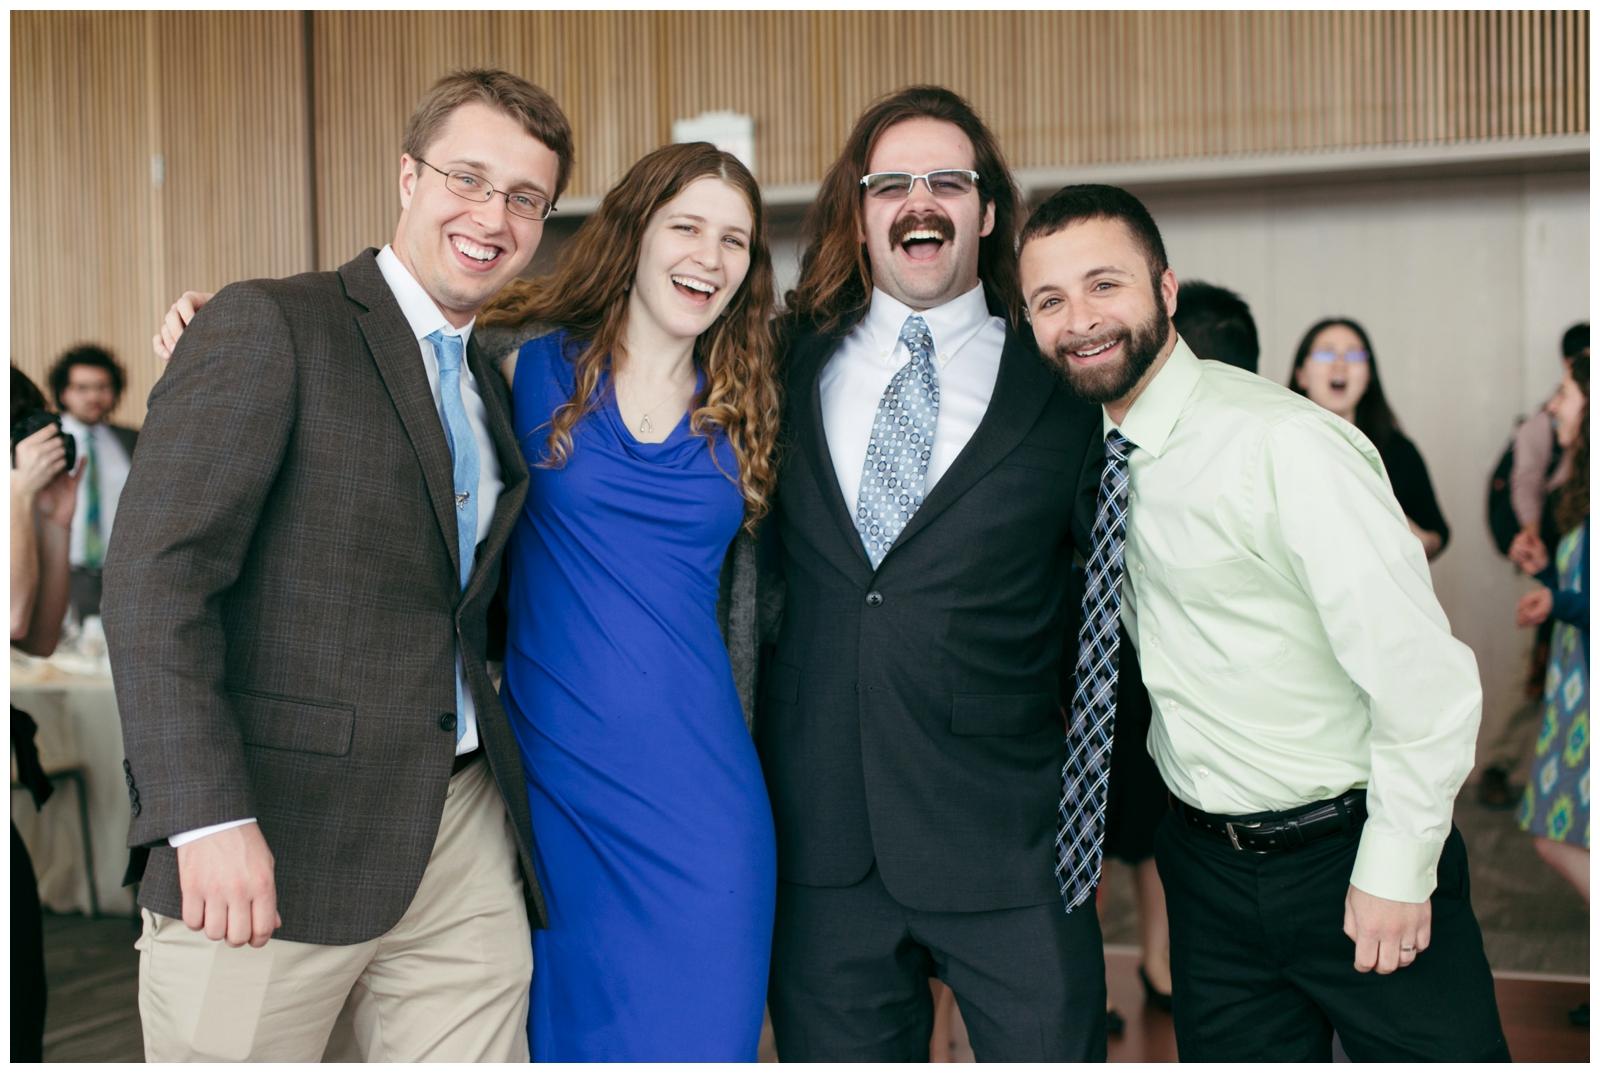 Samberg-Conference-Center-Boston-Wedding-Photographer-Bailey-Q-Photo-129.jpg